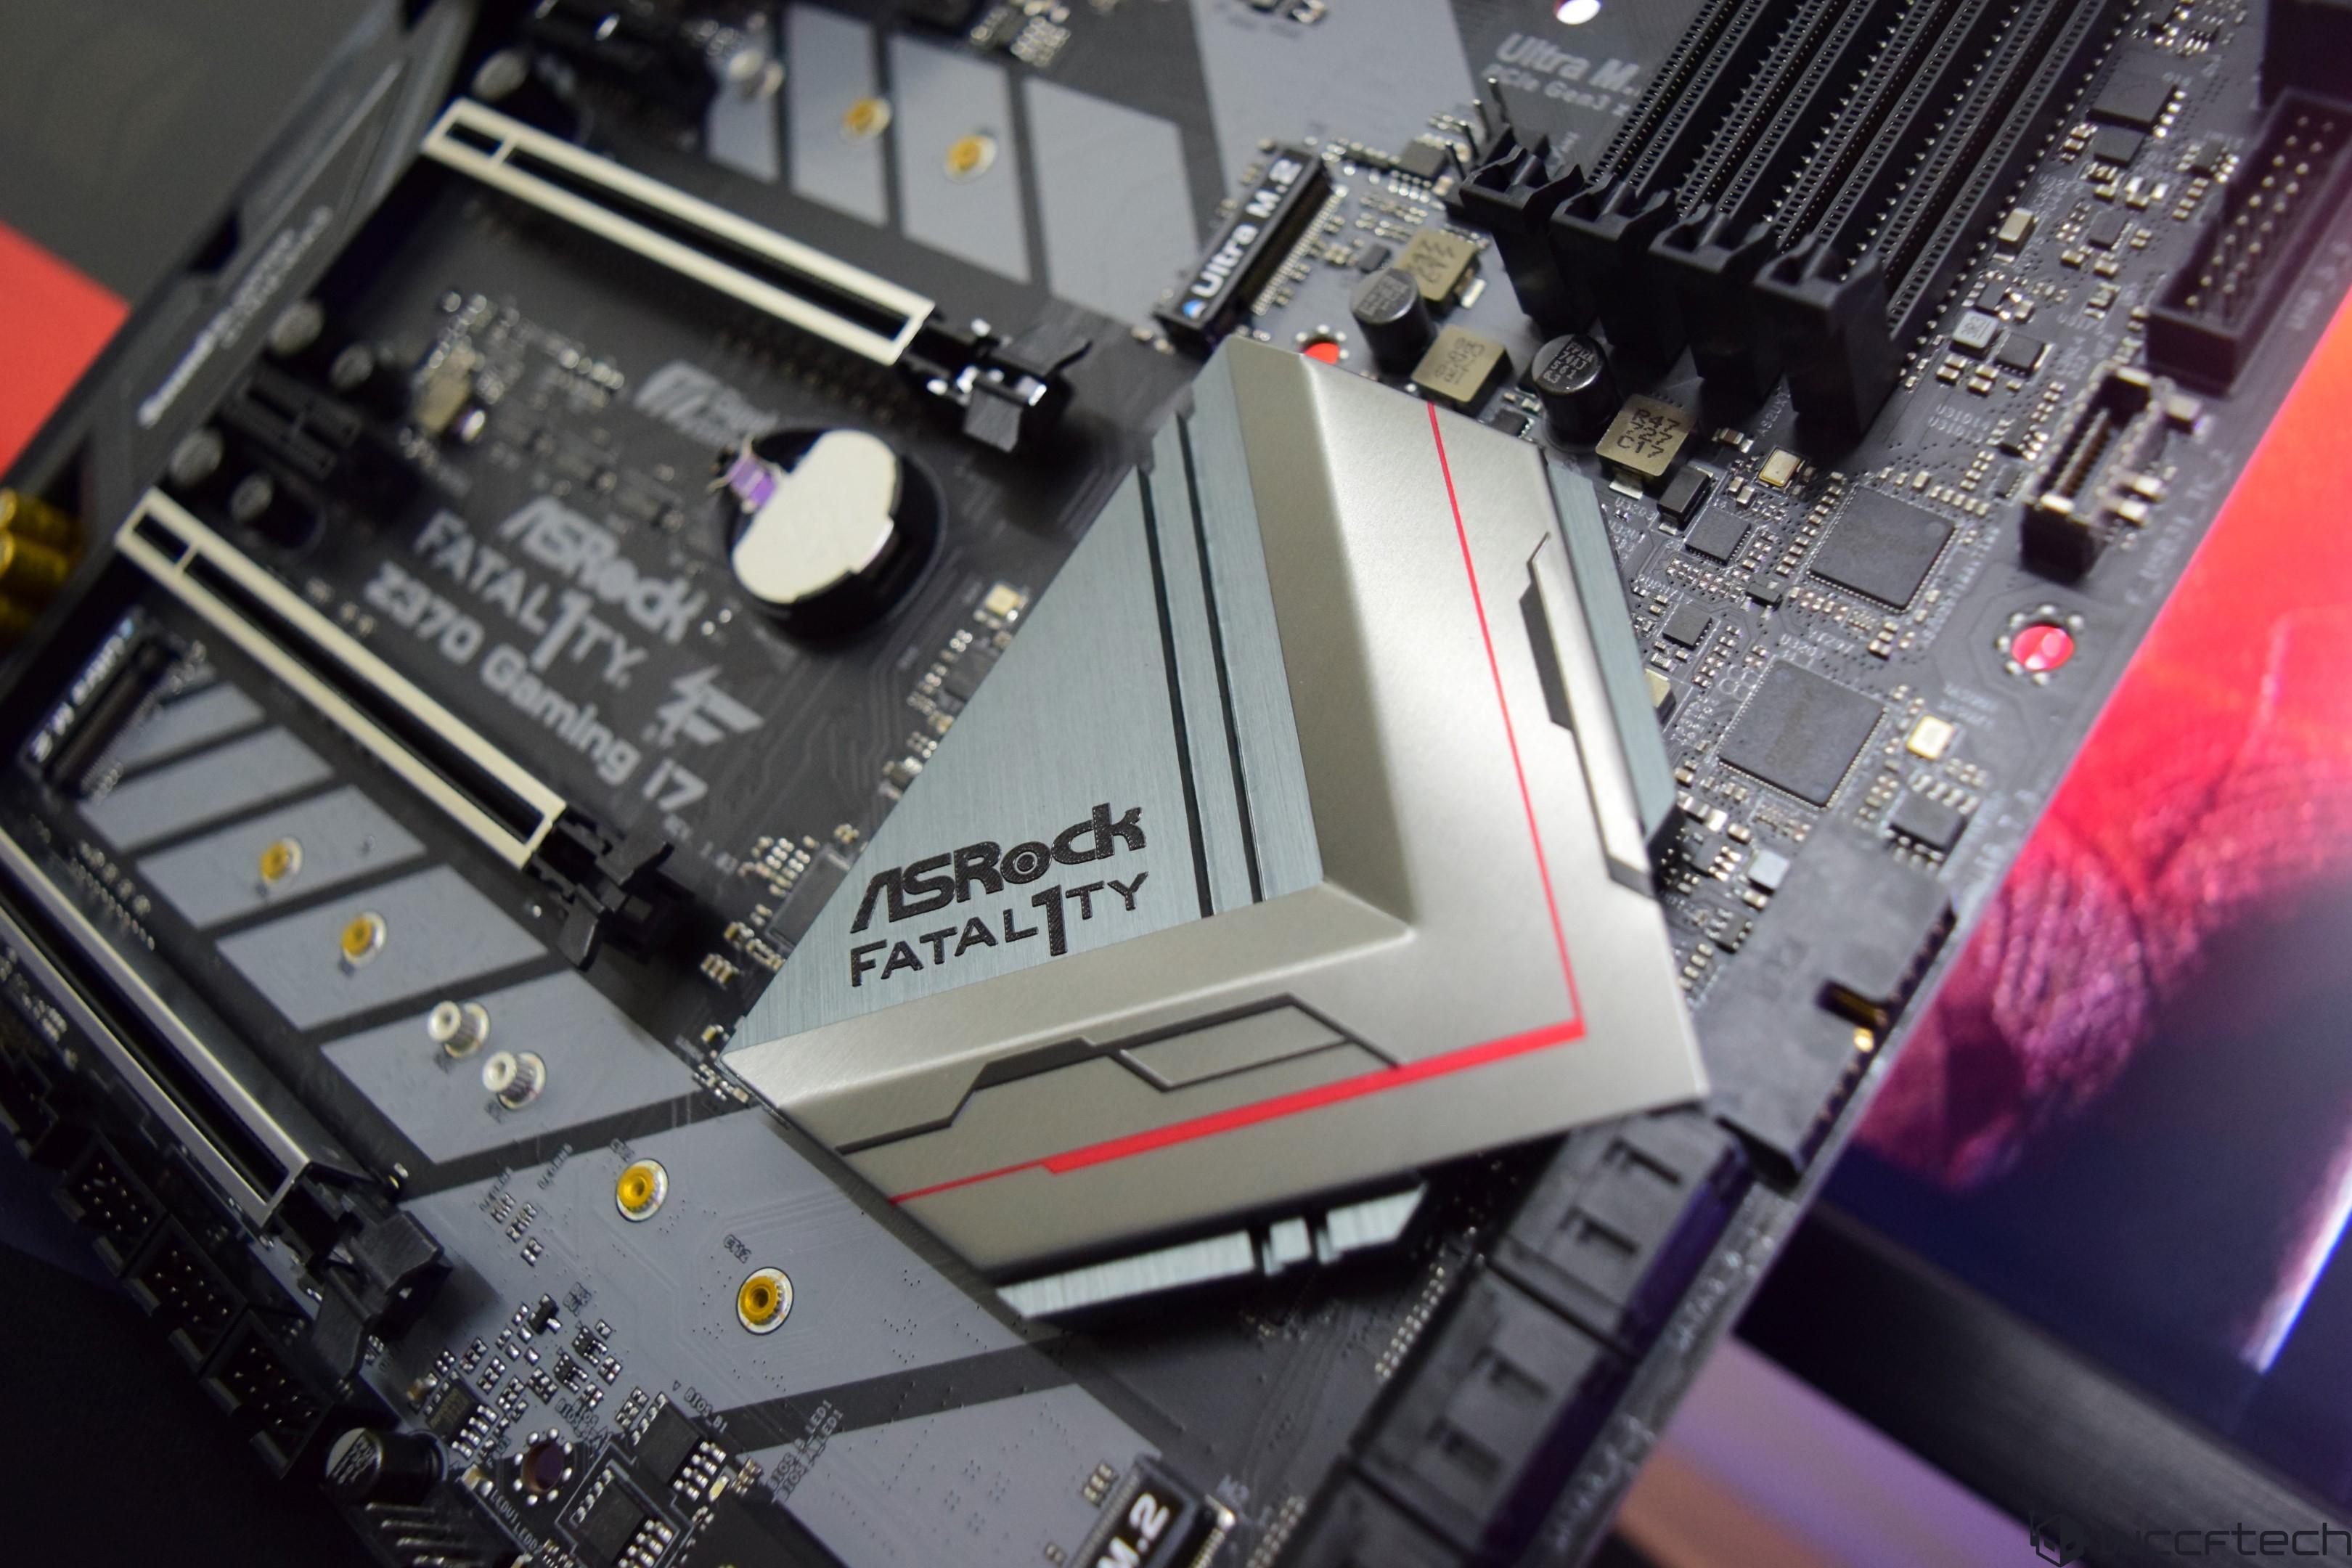 Intel Core i7-8700K, Core i5-8600K, Core i5-8400 CPU Review